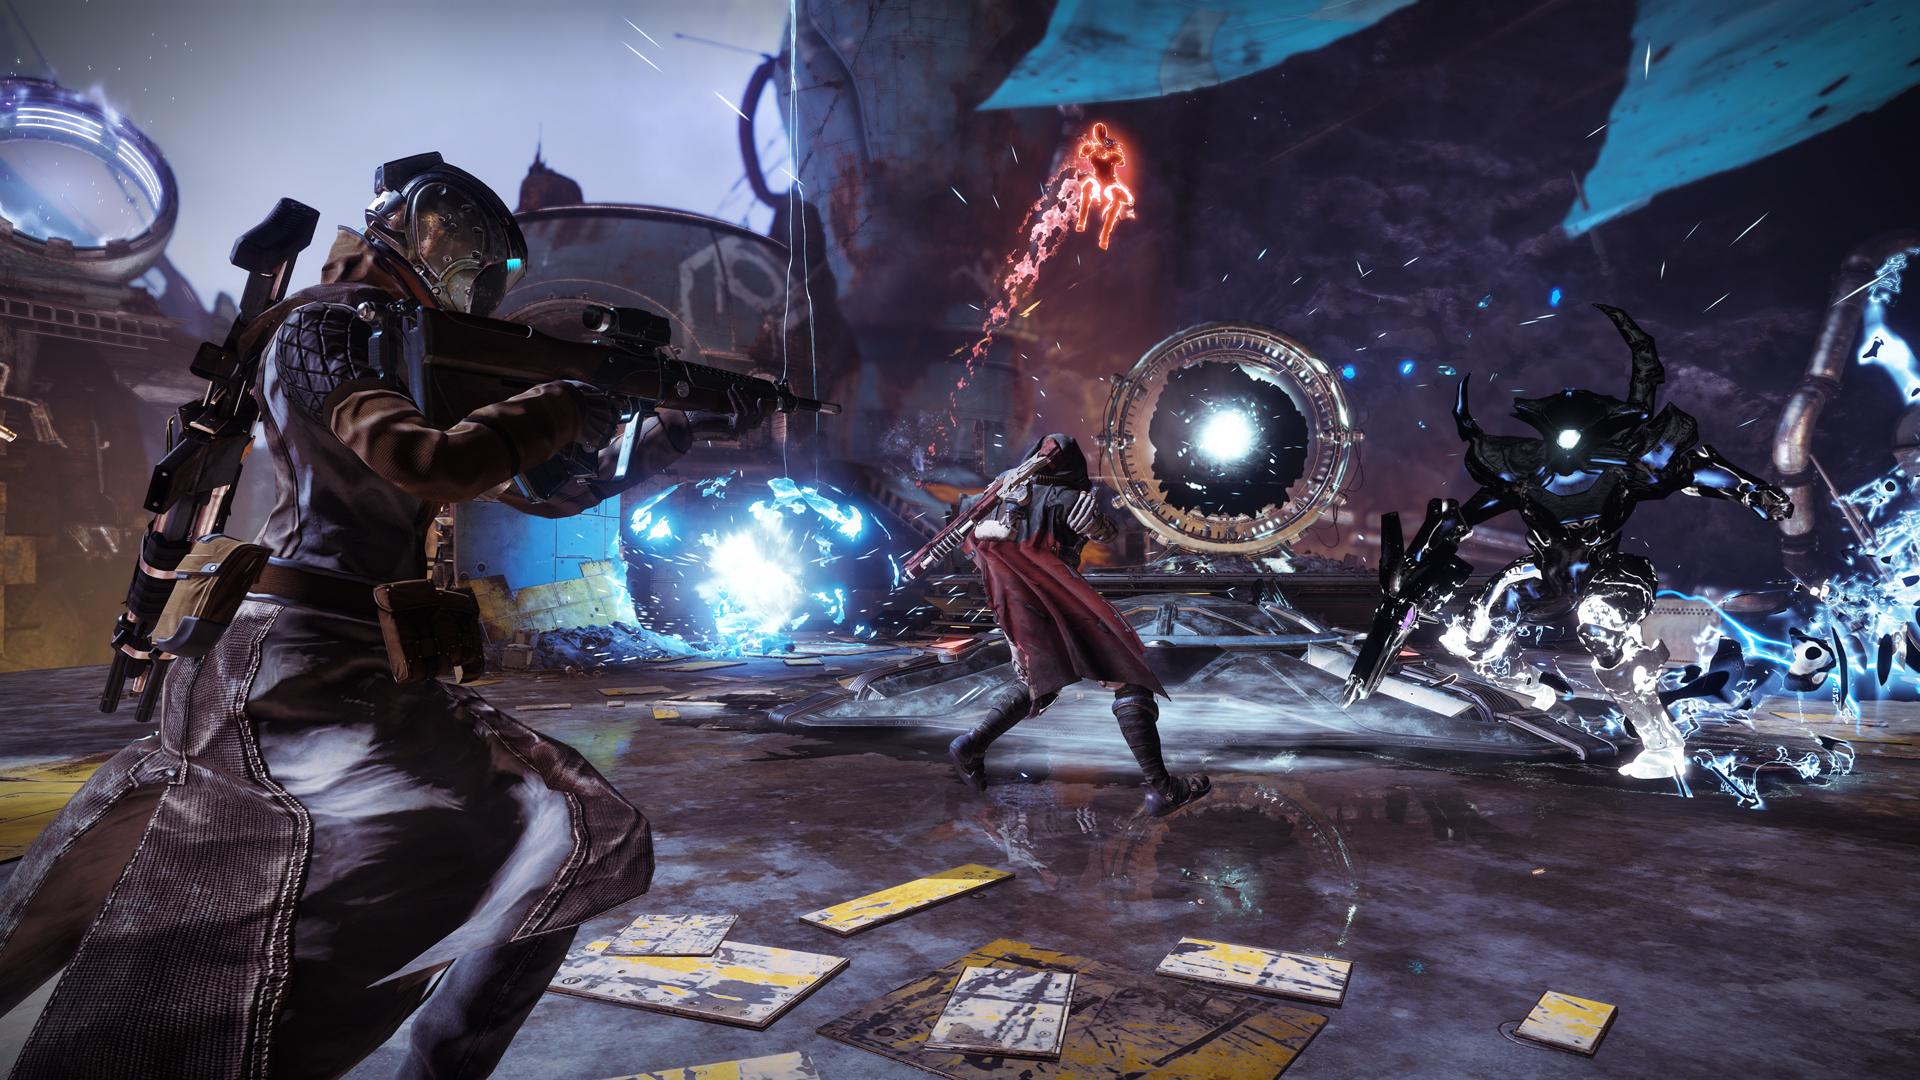 Destiny 2 is free on Battle.net until Nov. 18